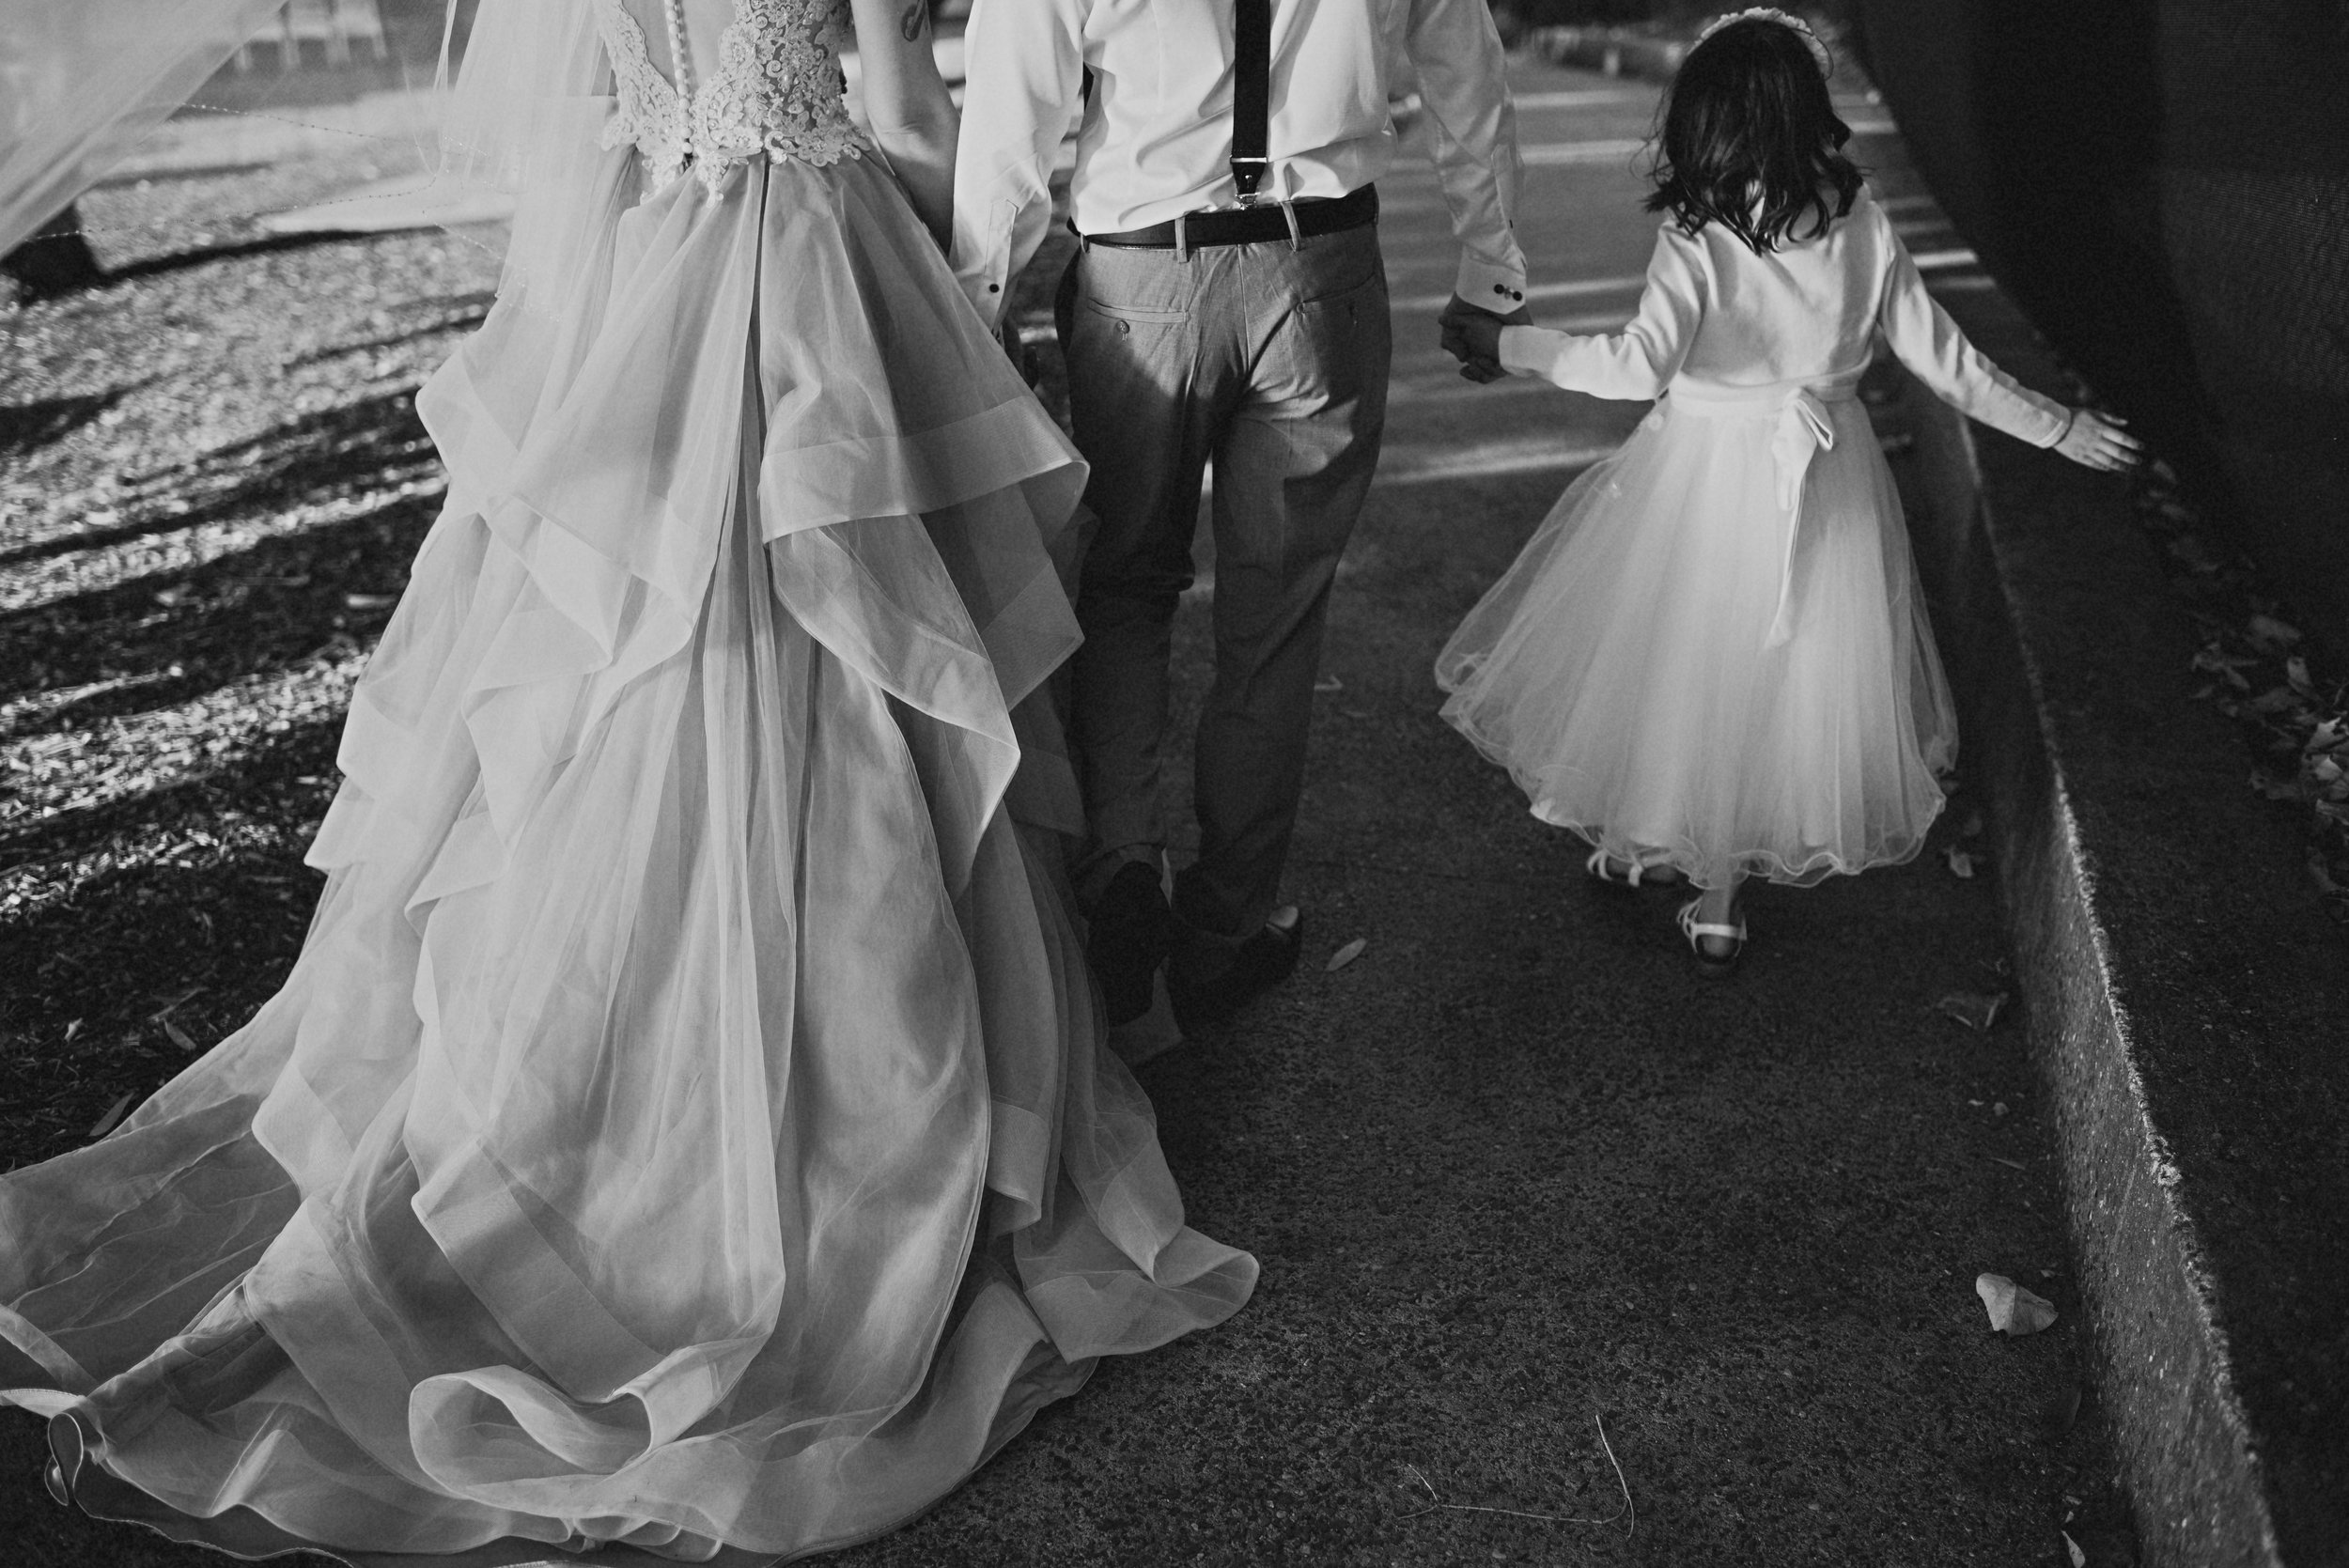 20180903_Julieanne_Nathan_Wedding-547-Edit-4.jpg